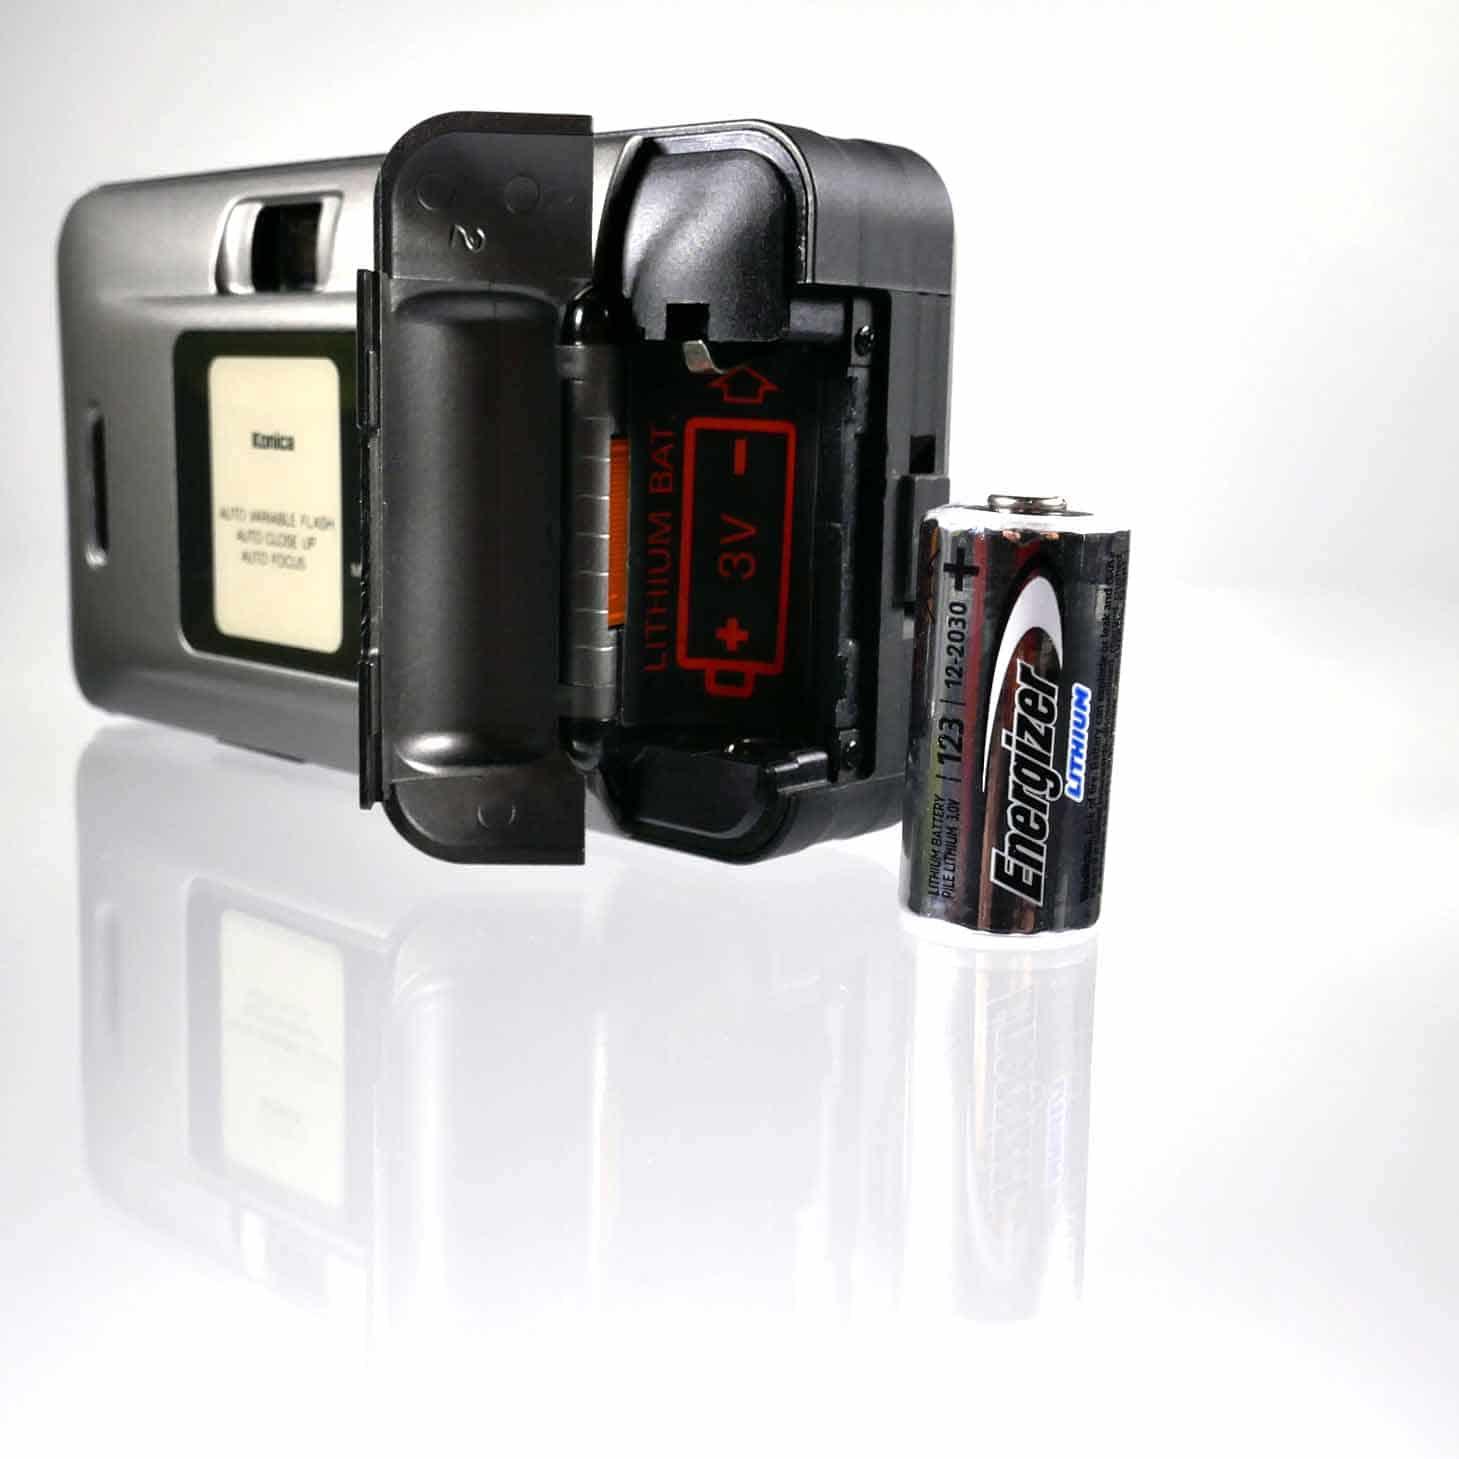 clean-cameras-Konica-Big.mini-01